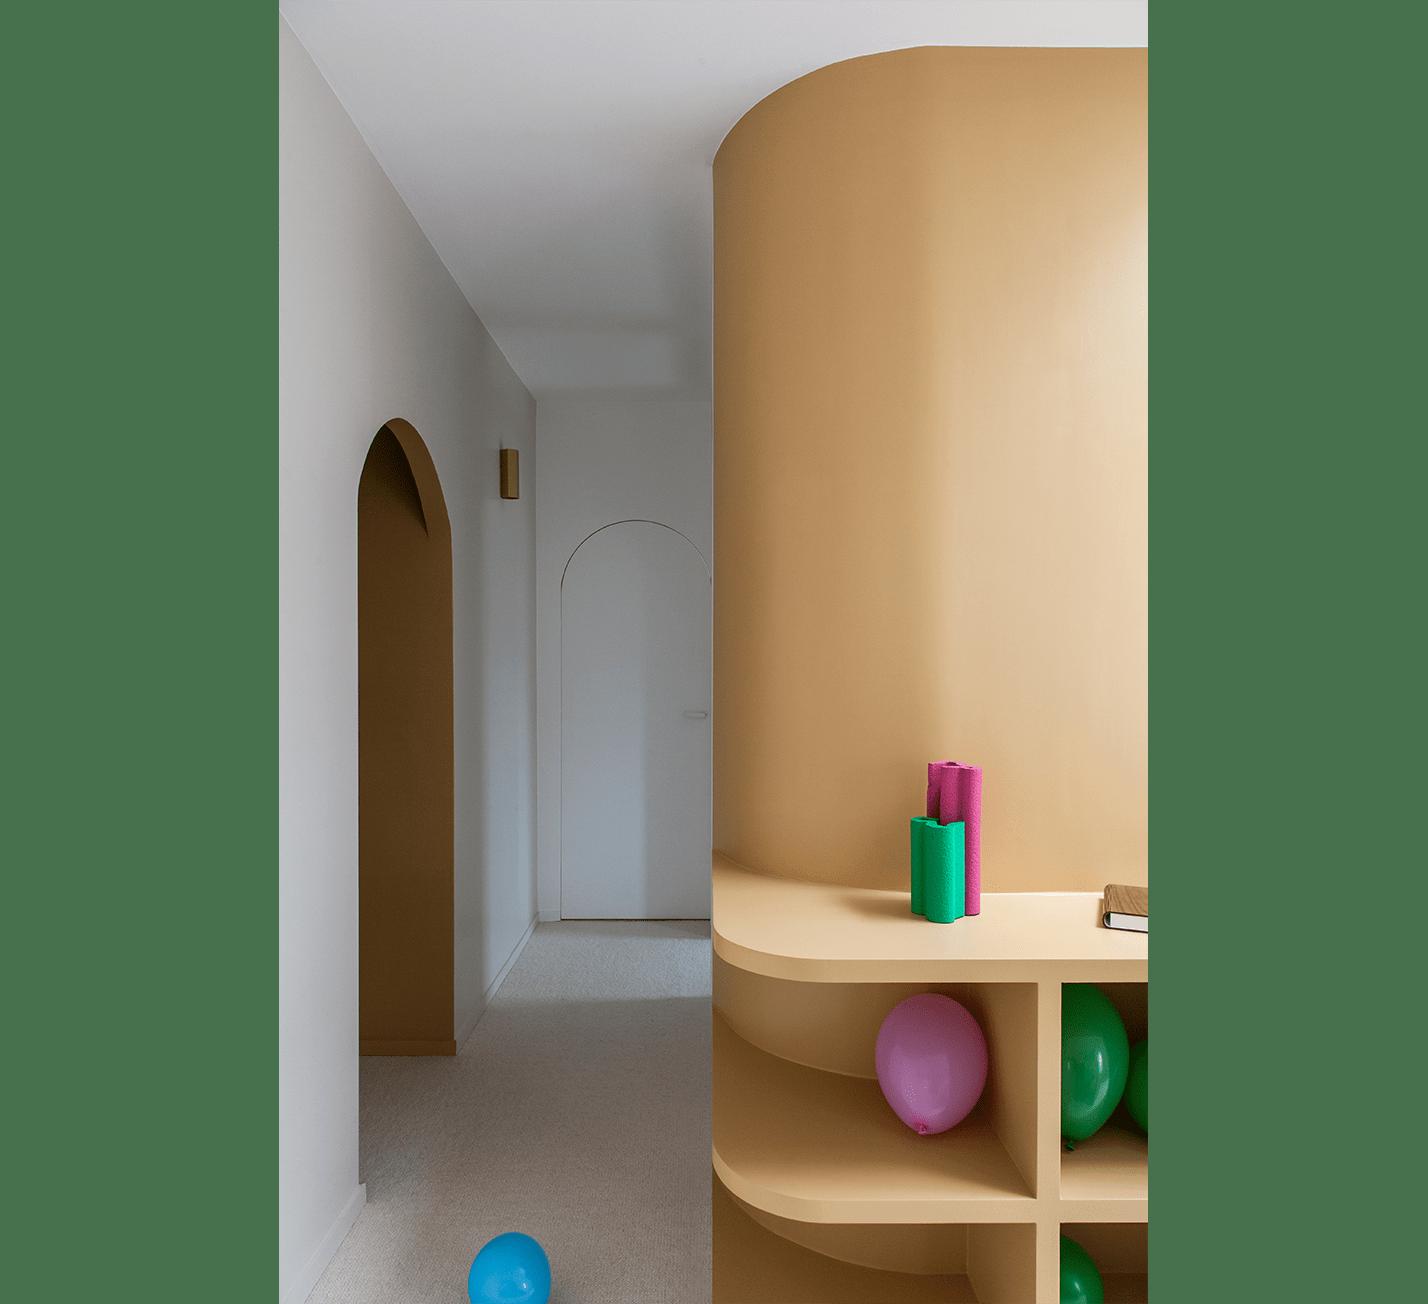 Projet-Arlequin-Atelier-Steve-Pauline-Borgia-Architecture-interieur-07-min